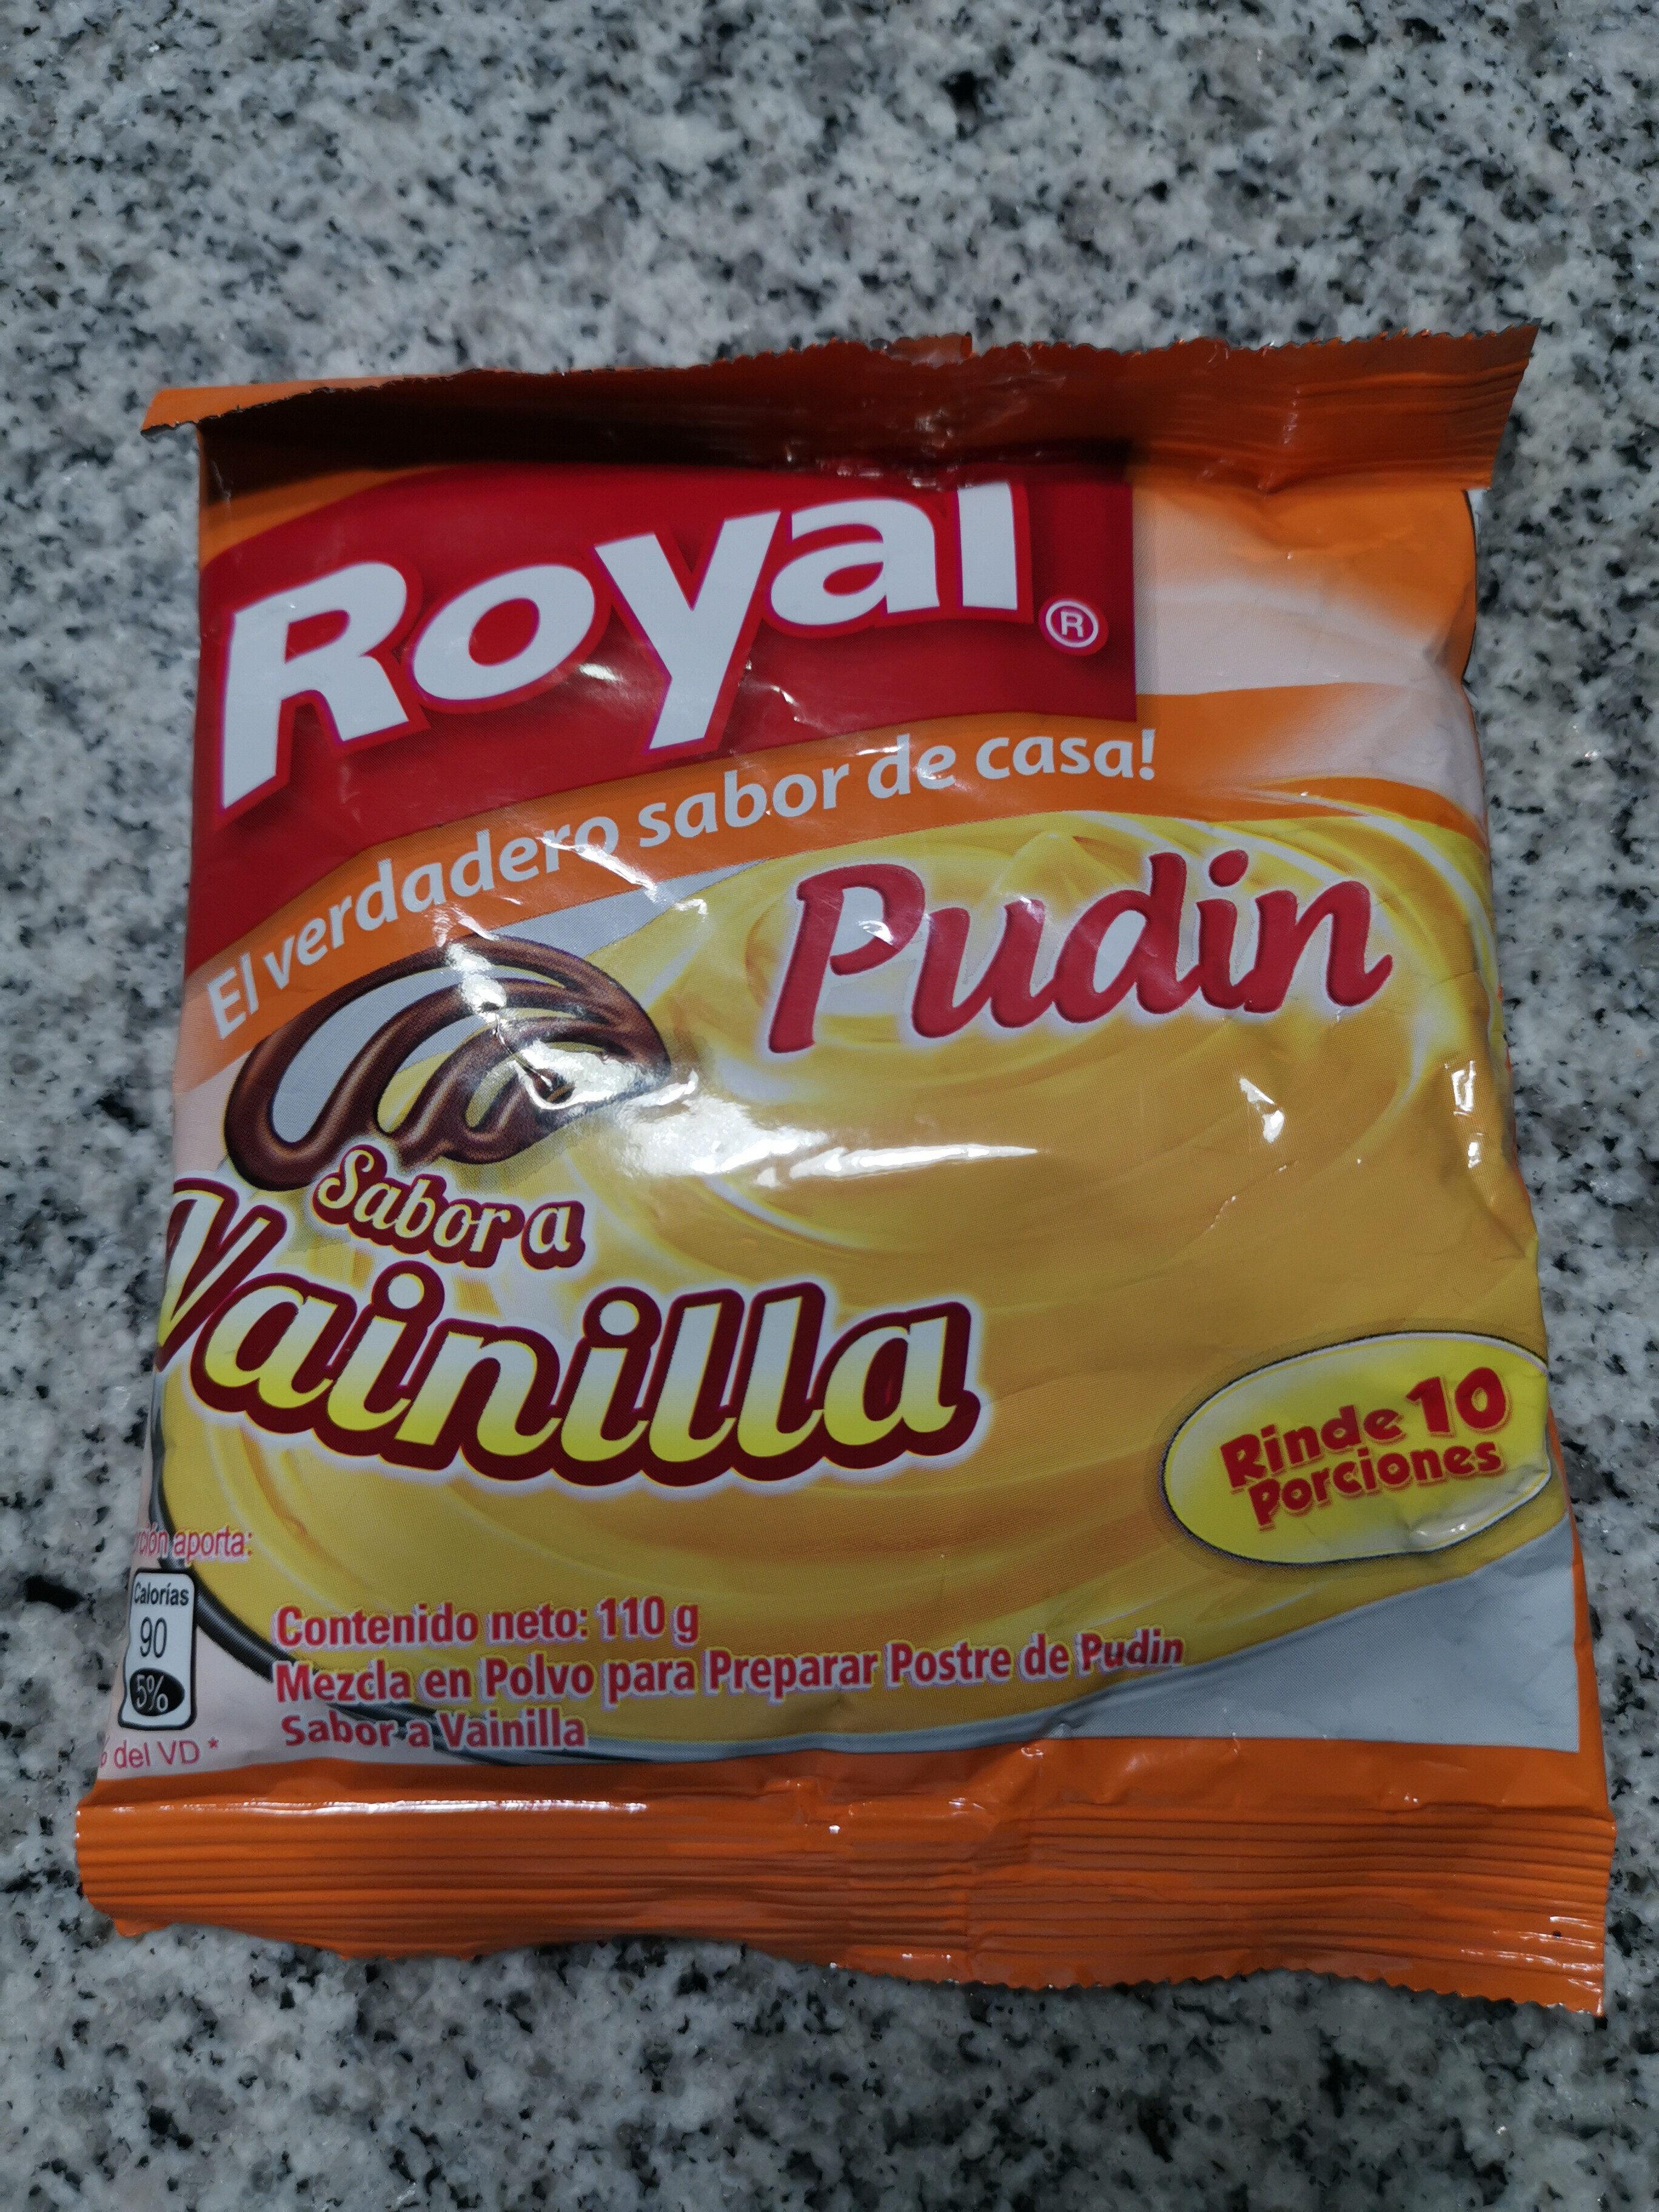 Pudin sabor a Vainilla - Product - es